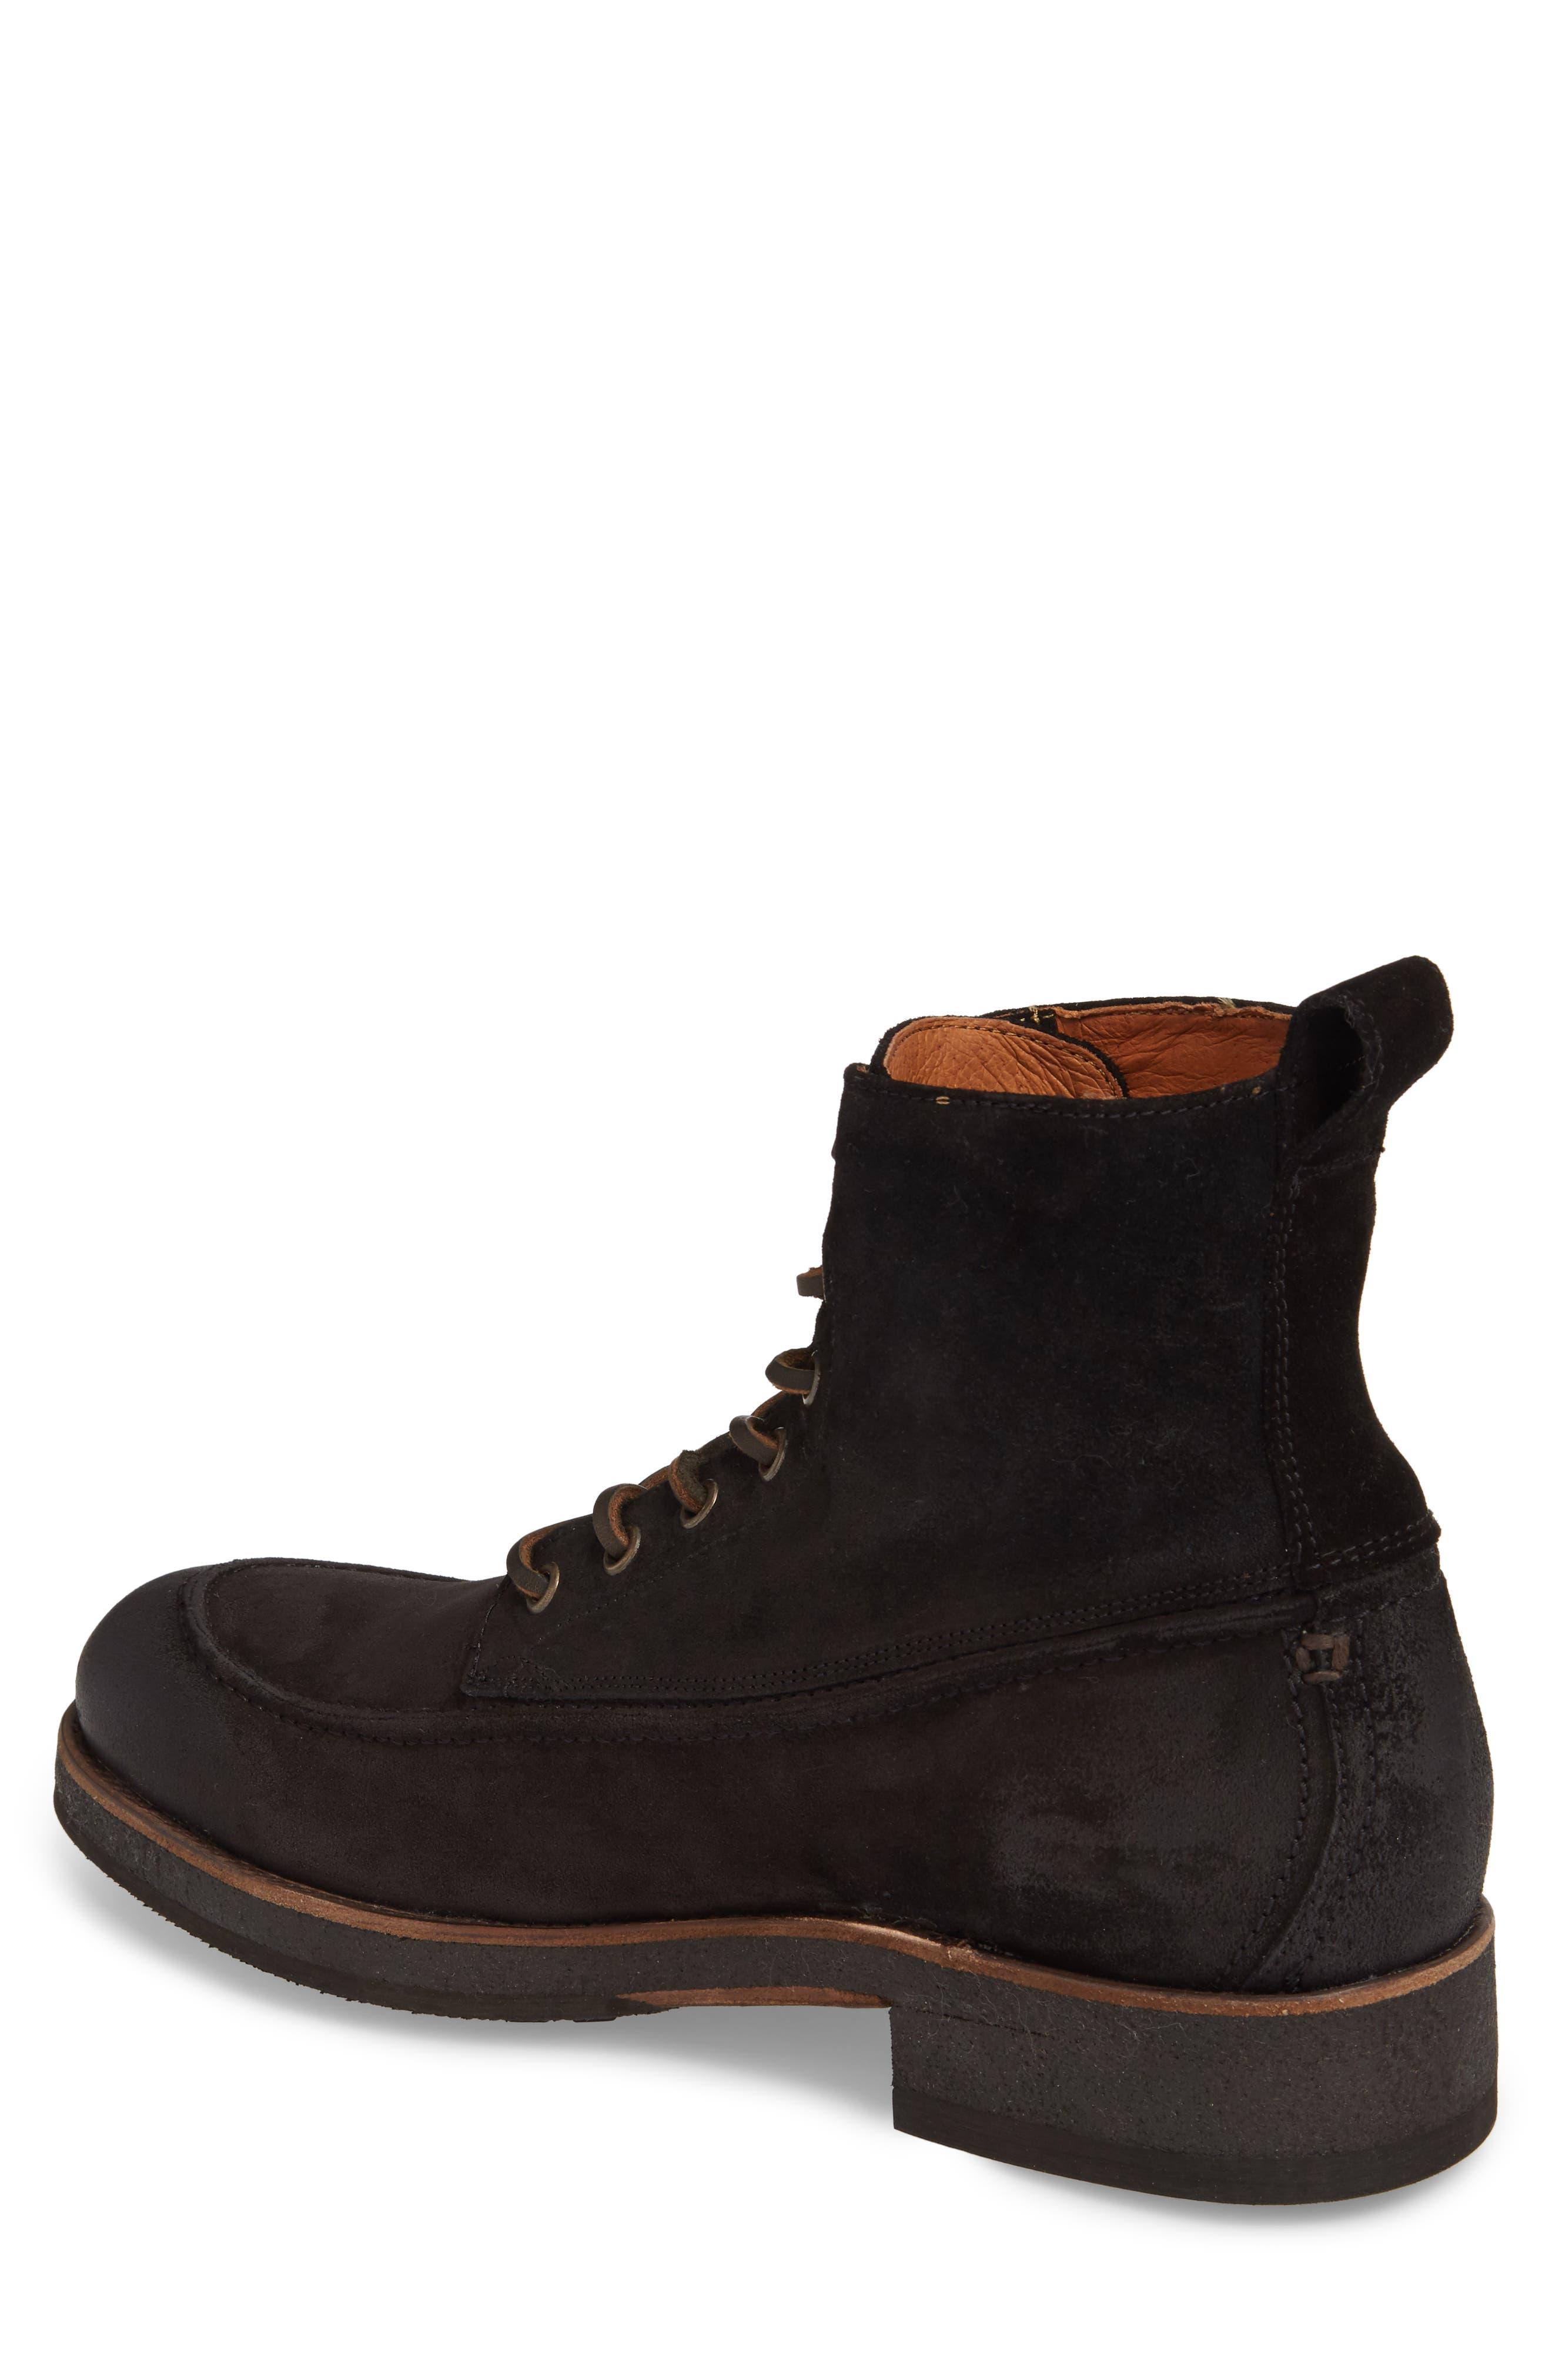 Rainier Waxed Work Boot,                             Alternate thumbnail 2, color,                             Black Waxed Suede